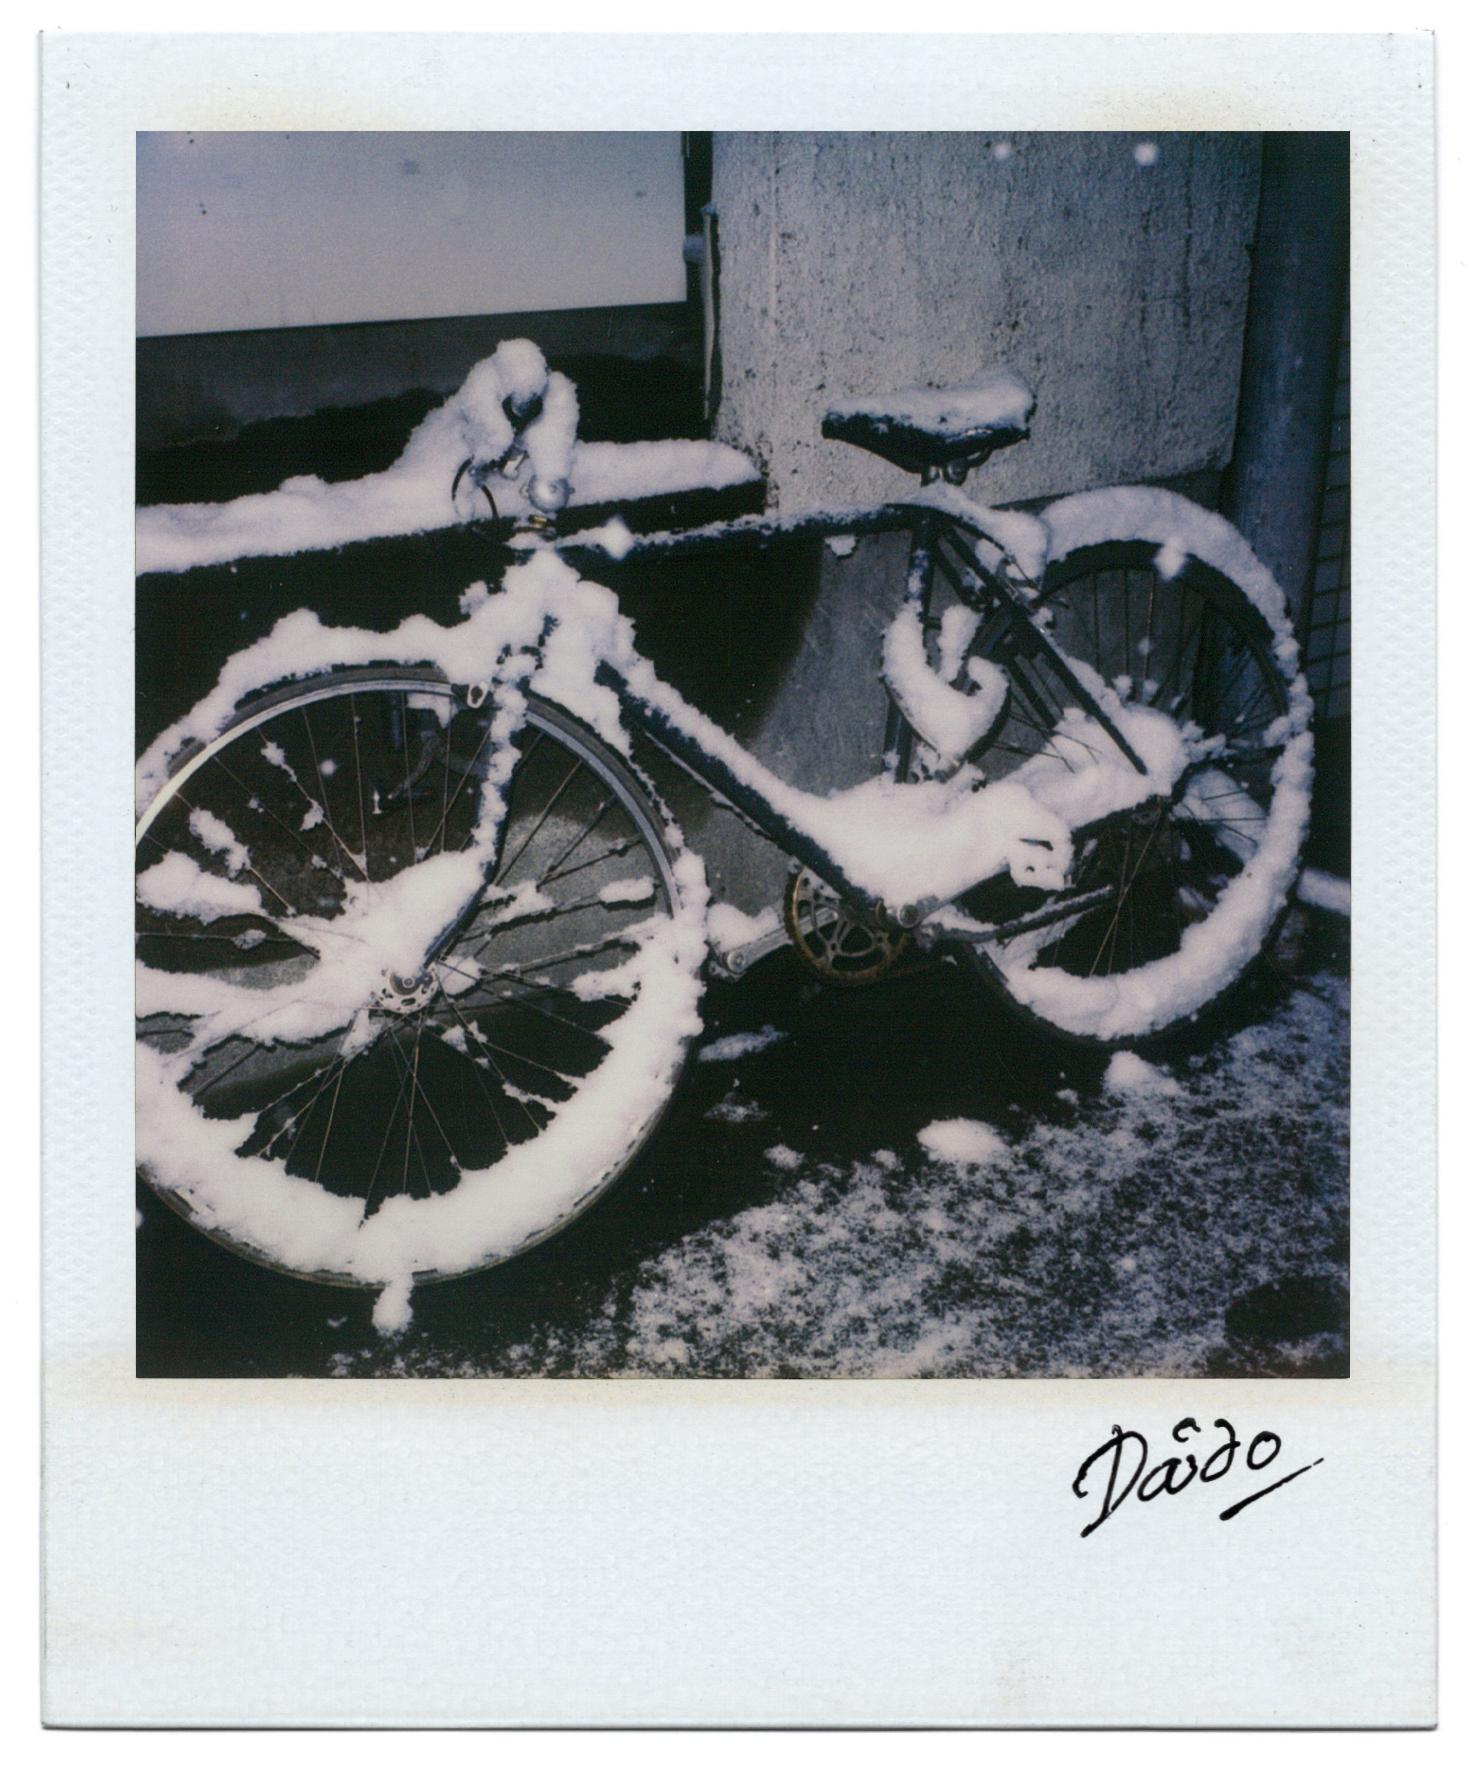 Moriyama Daido, Passage, 1998, Polaroid, 11 x 9 cm3